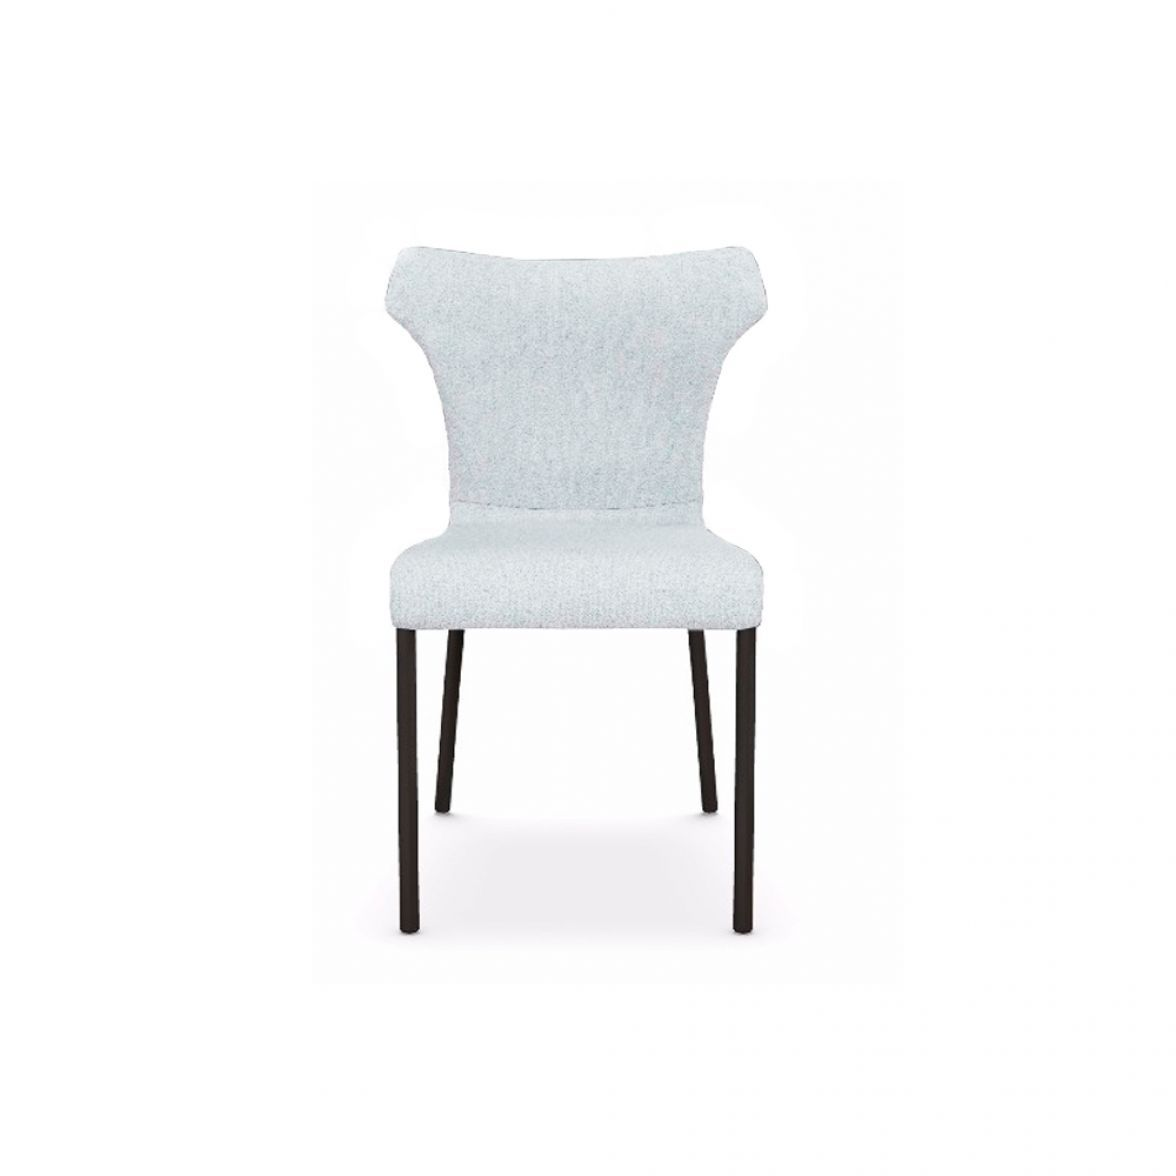 Papilio chair фото цена